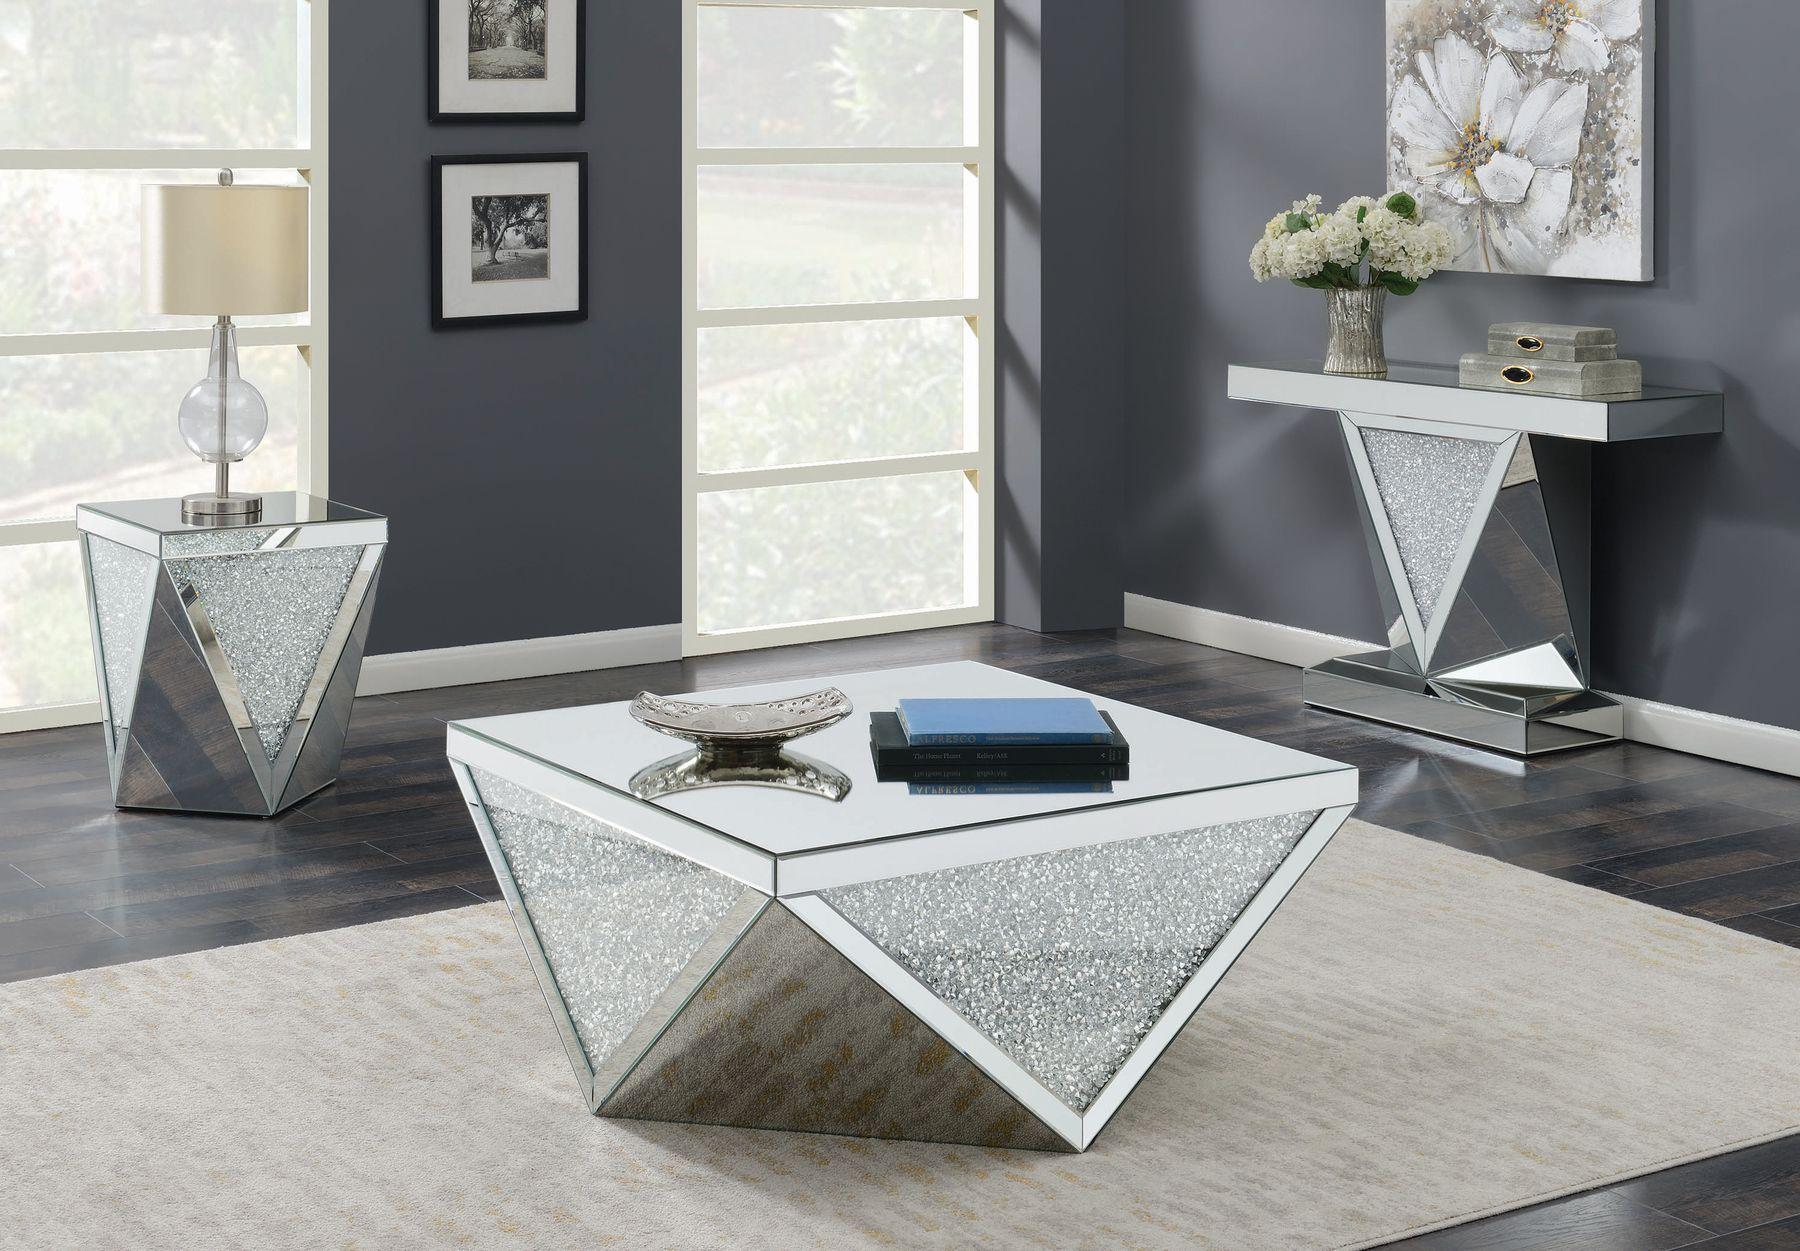 Cs508 Coffee Table 722508 Coaster Furniture Coffee Tables In 2021 Mirrored Coffee Tables Solid Coffee Table Living Room Table Sets [ 1251 x 1800 Pixel ]